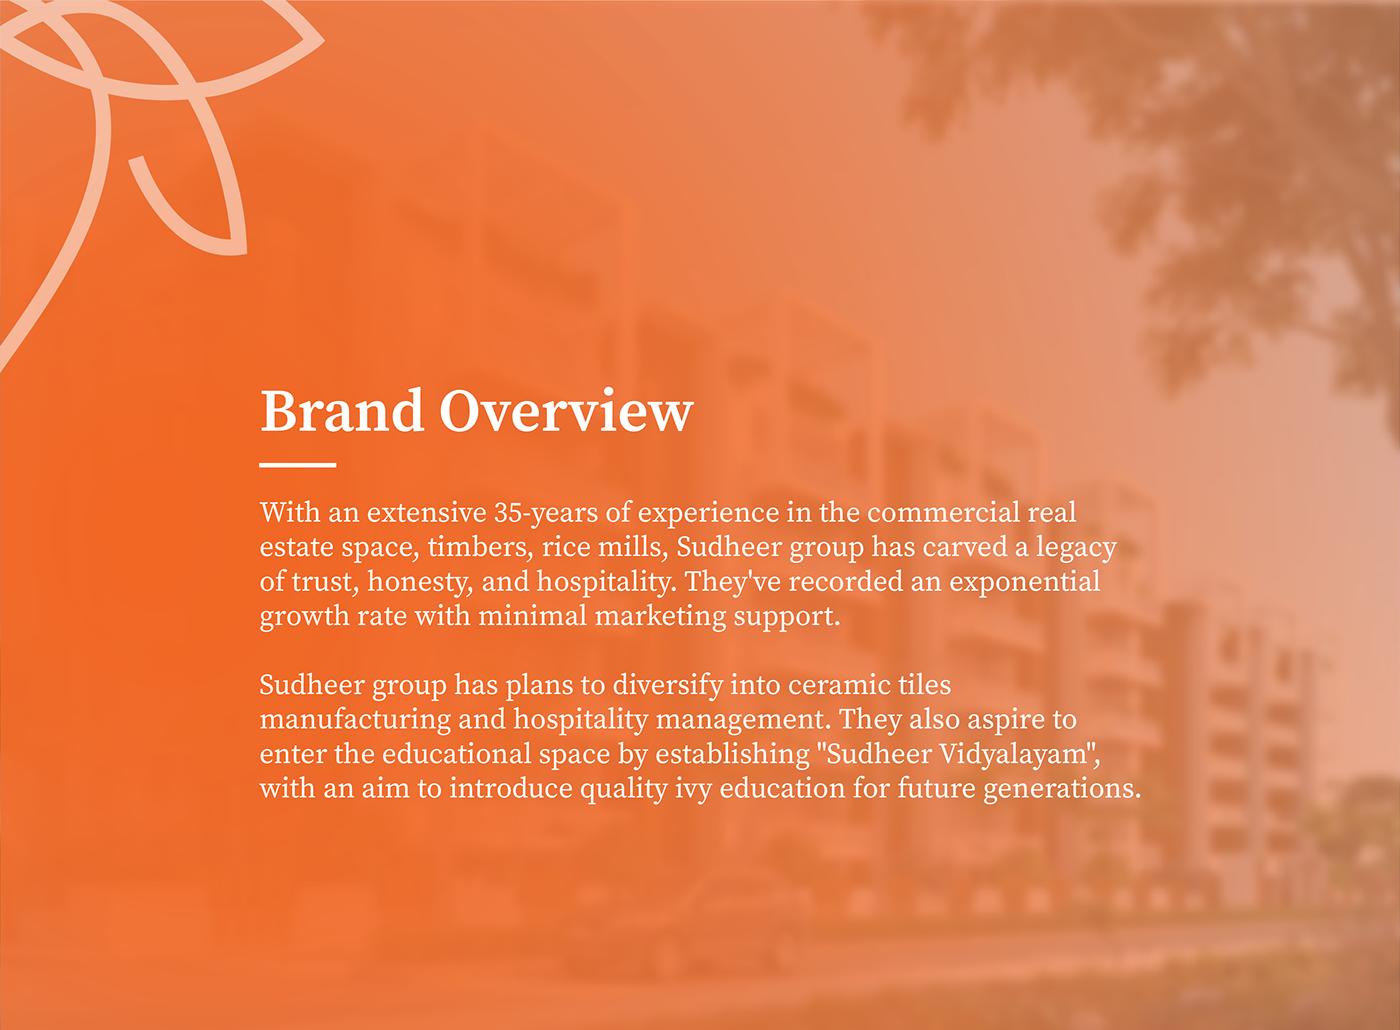 branding  business model experiance design Interaction design  marketing   Service design social media Space design system design visual identity